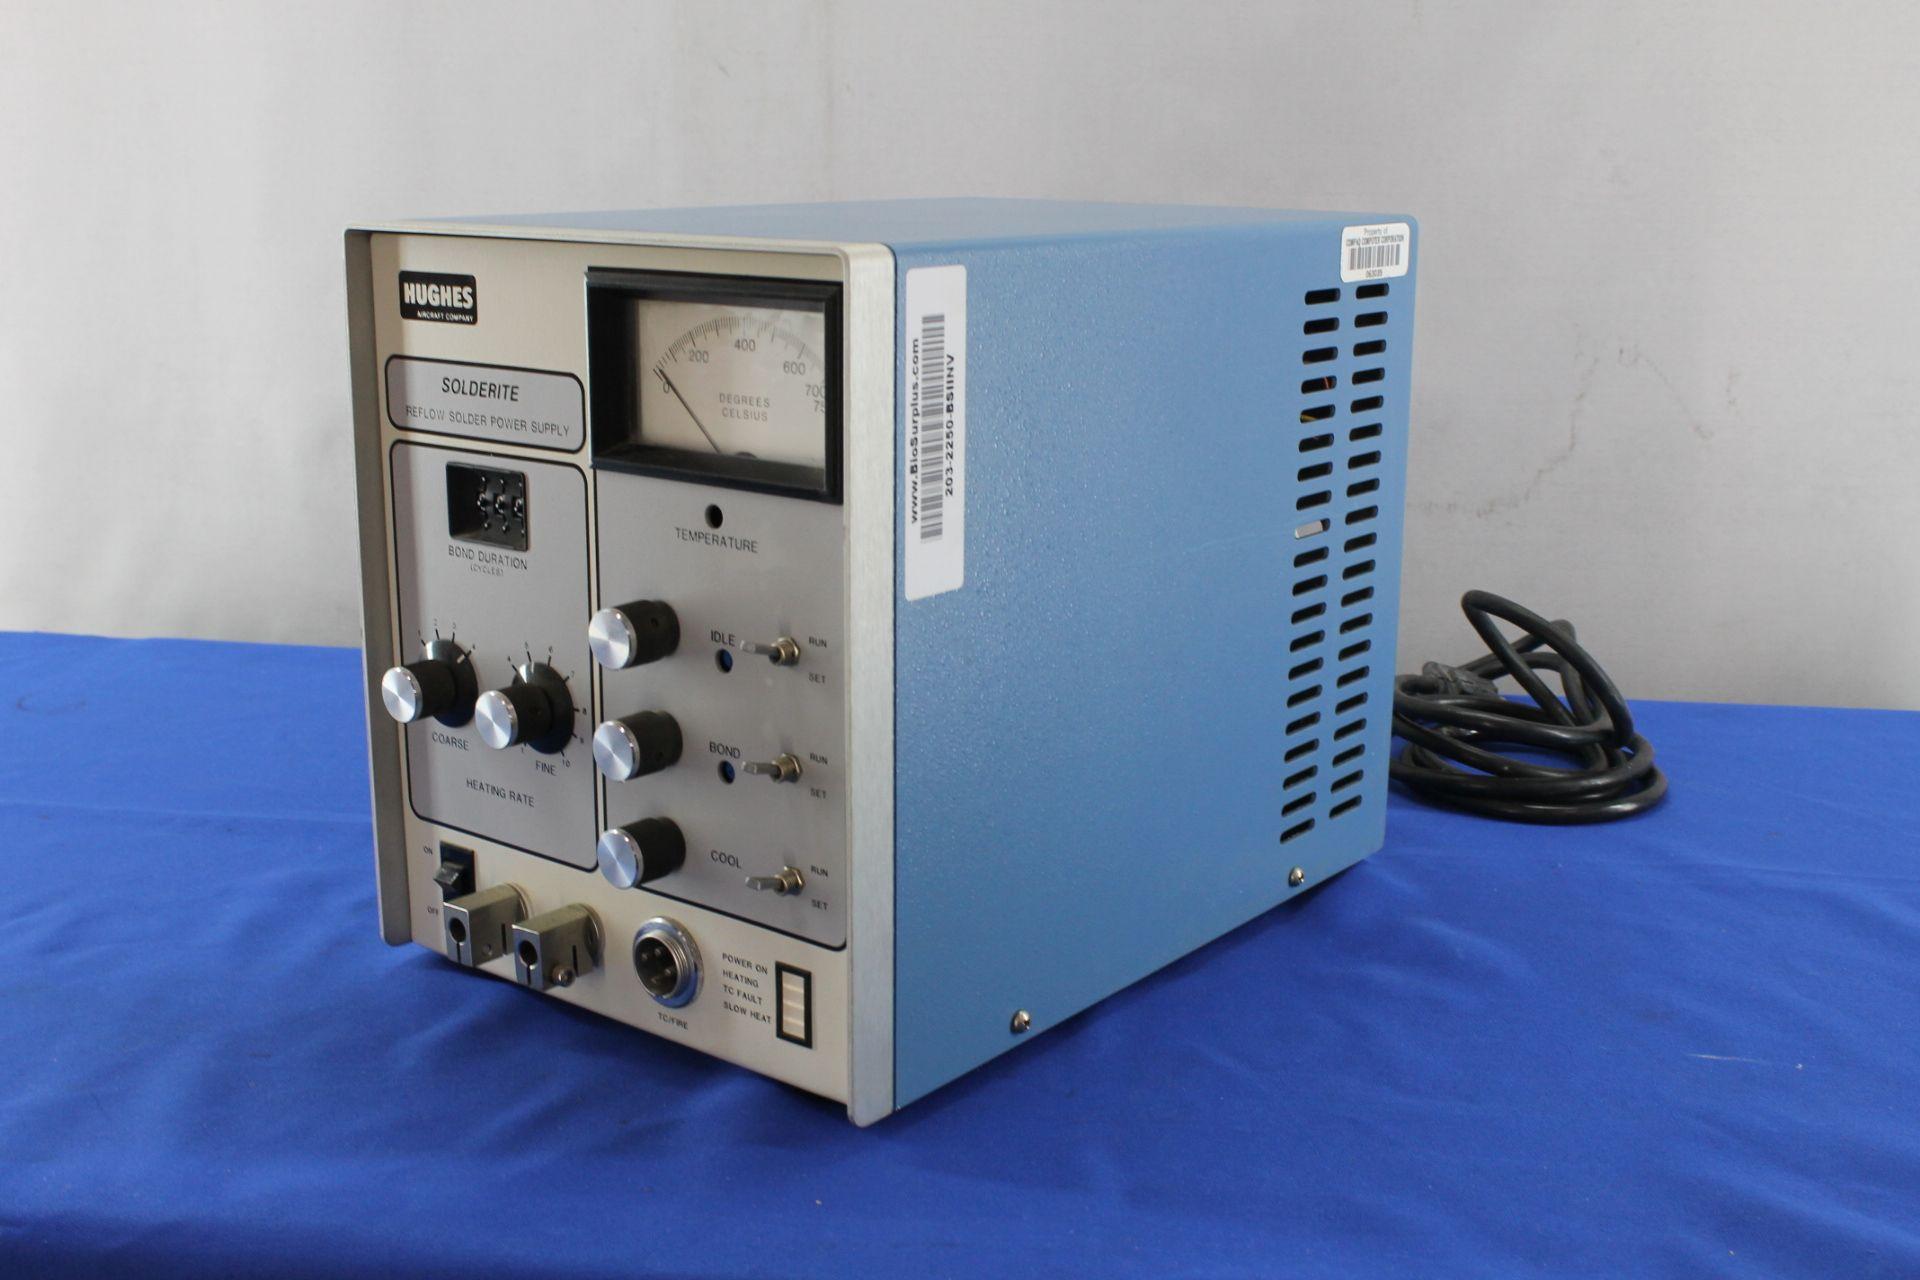 Hughes HTT-650 Solderbrite Reflow Solder Power Supply (203-2250)